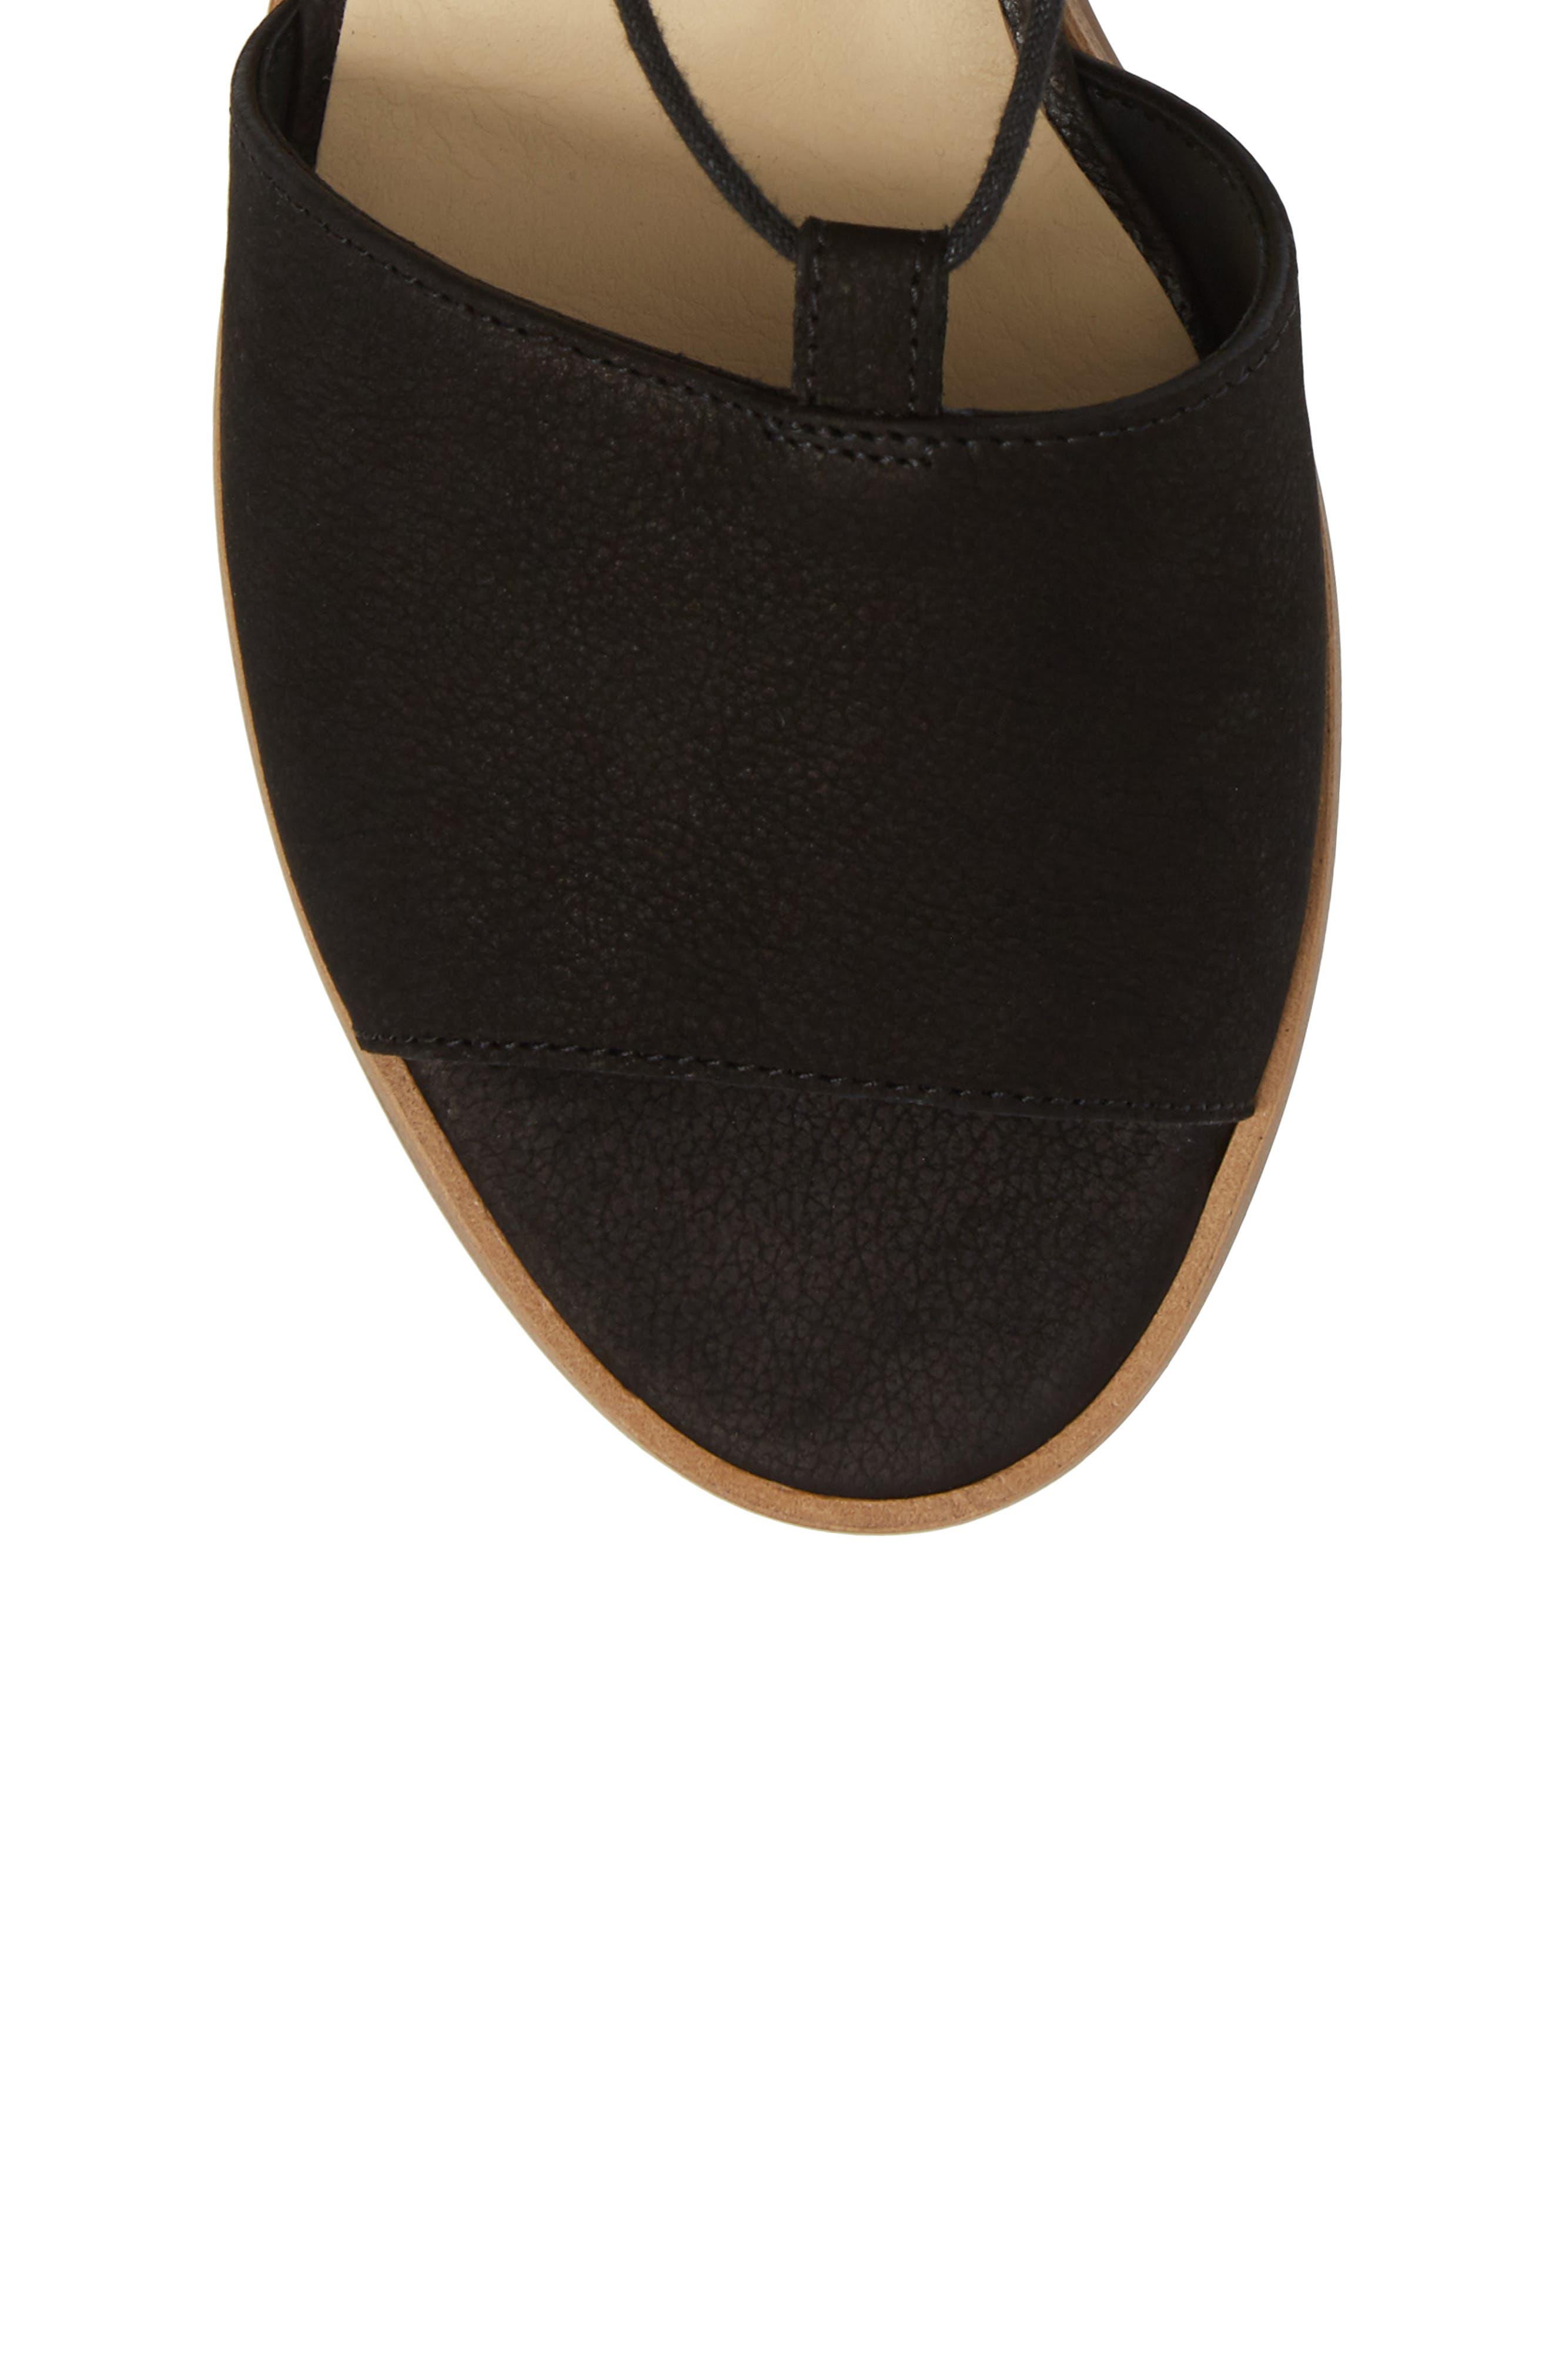 PAUL GREEN, Morea Lace-Up Sandal, Alternate thumbnail 5, color, BLACK LEATHER